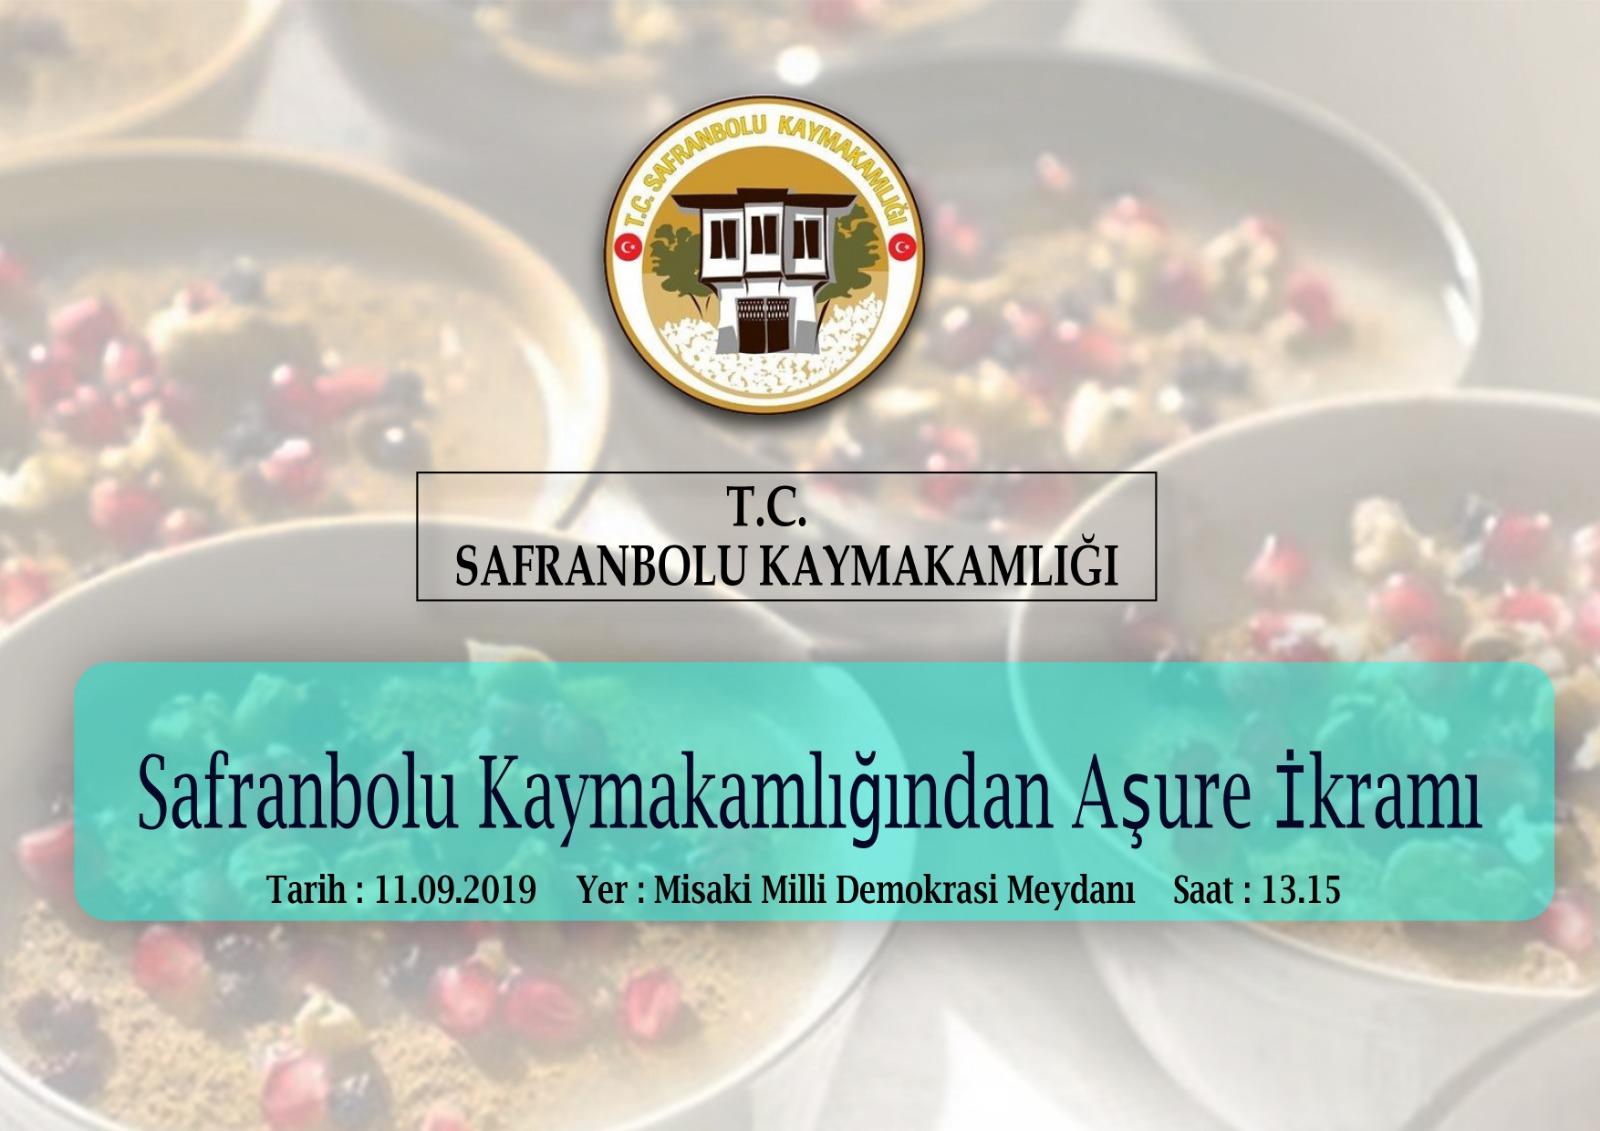 http://www.safranbolu.gov.tr/kurumlar/safranbolu.gov.tr/WhatsApp-Image-2019-09-10-at-150156.jpeg